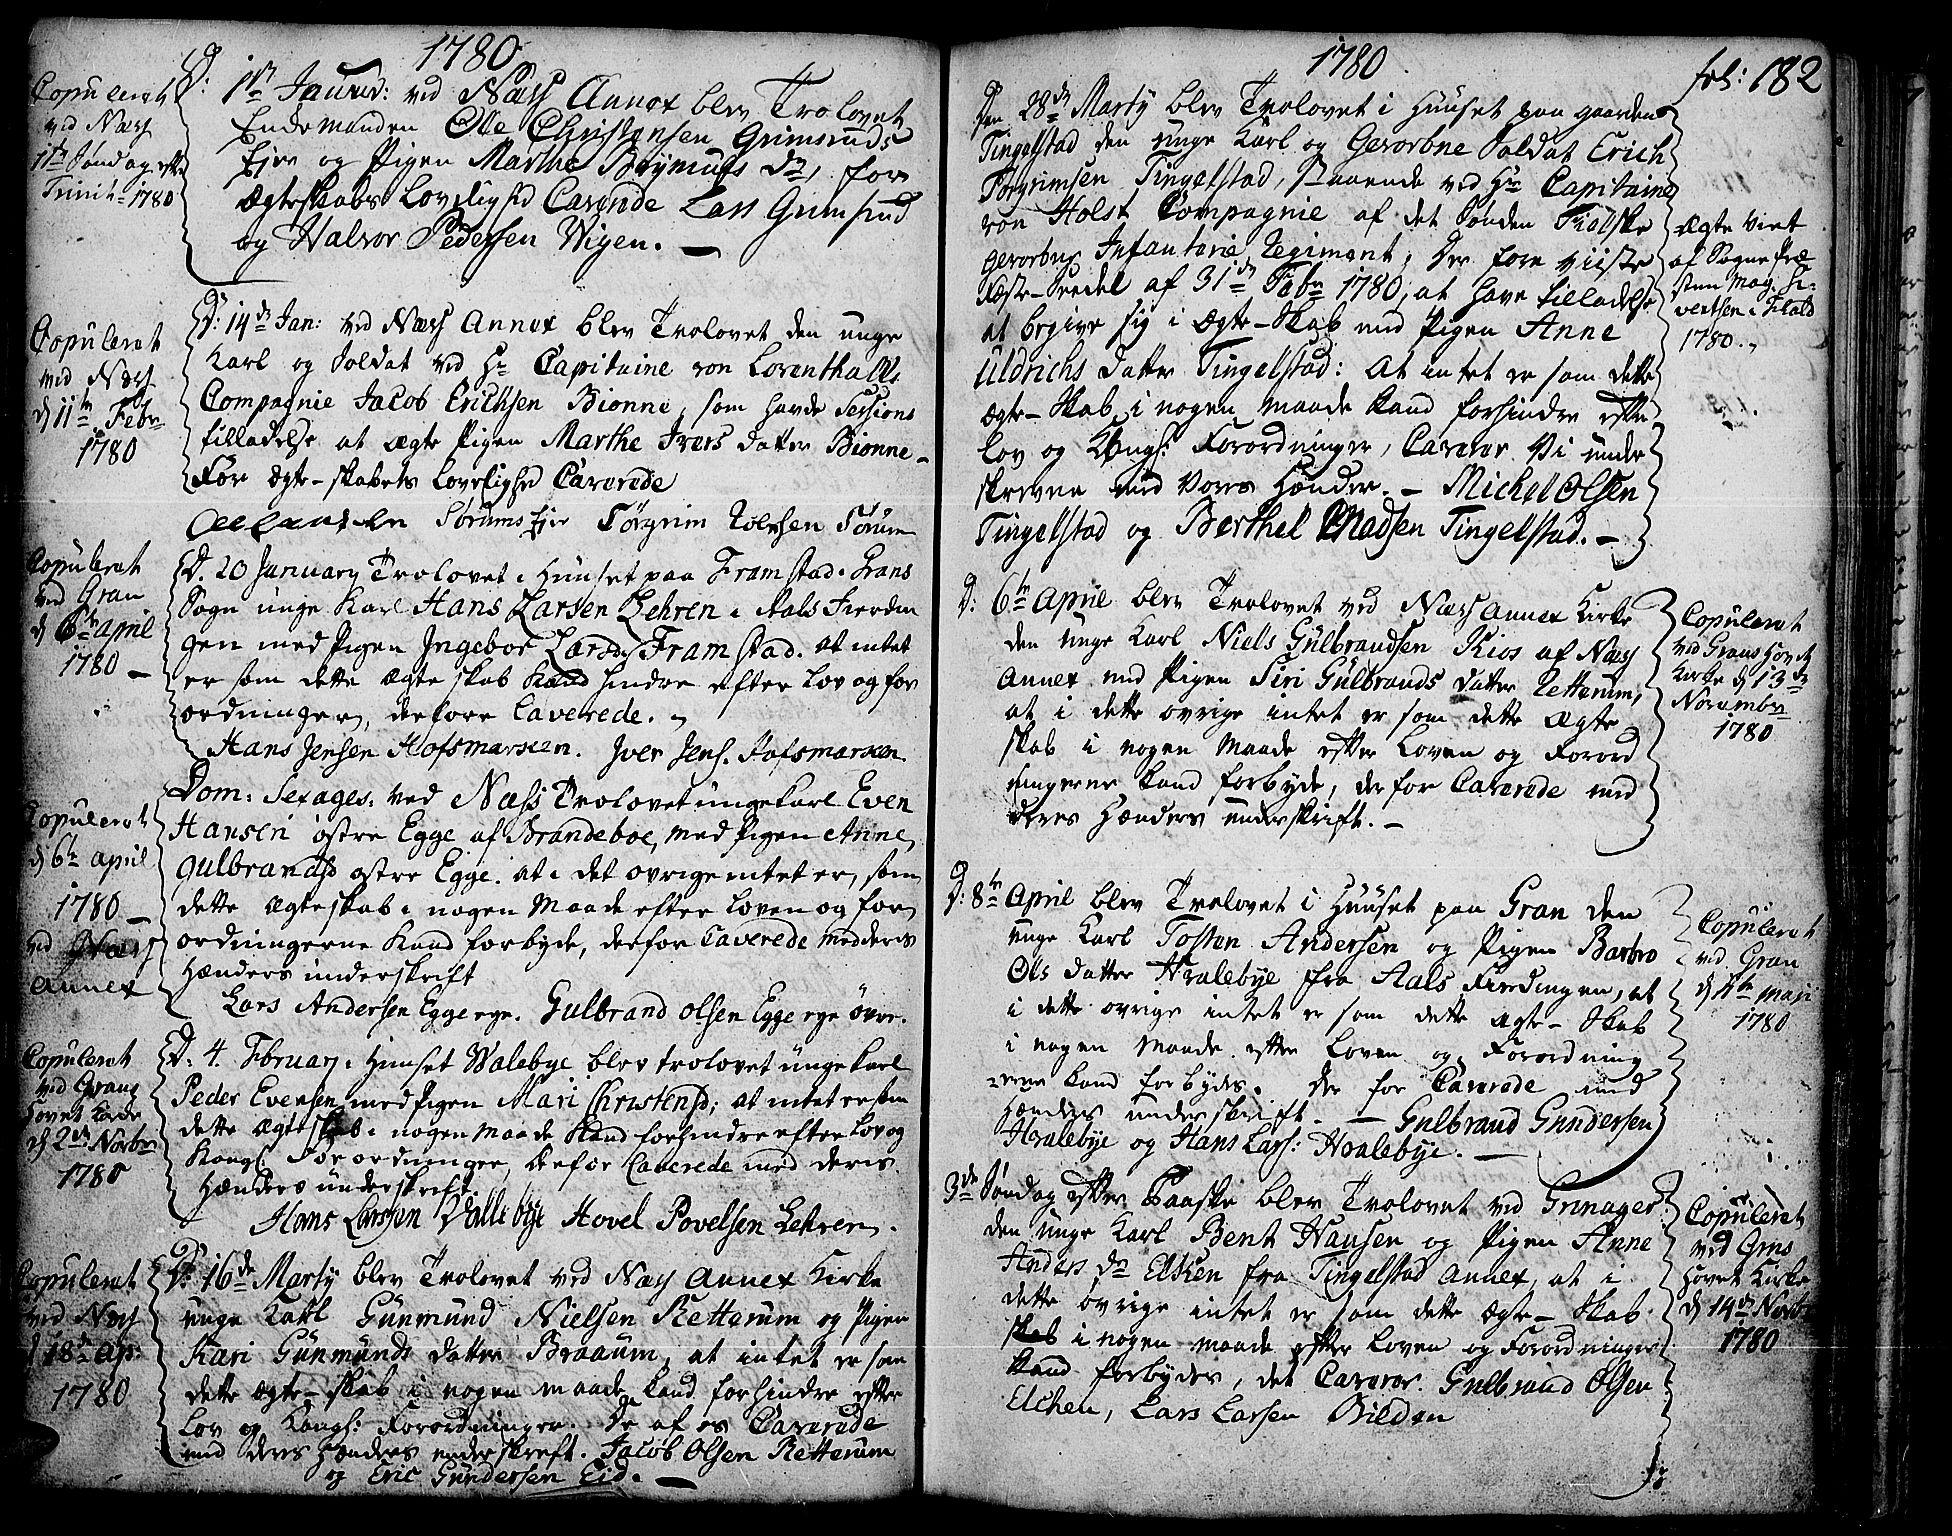 SAH, Gran prestekontor, Ministerialbok nr. 5, 1776-1788, s. 182